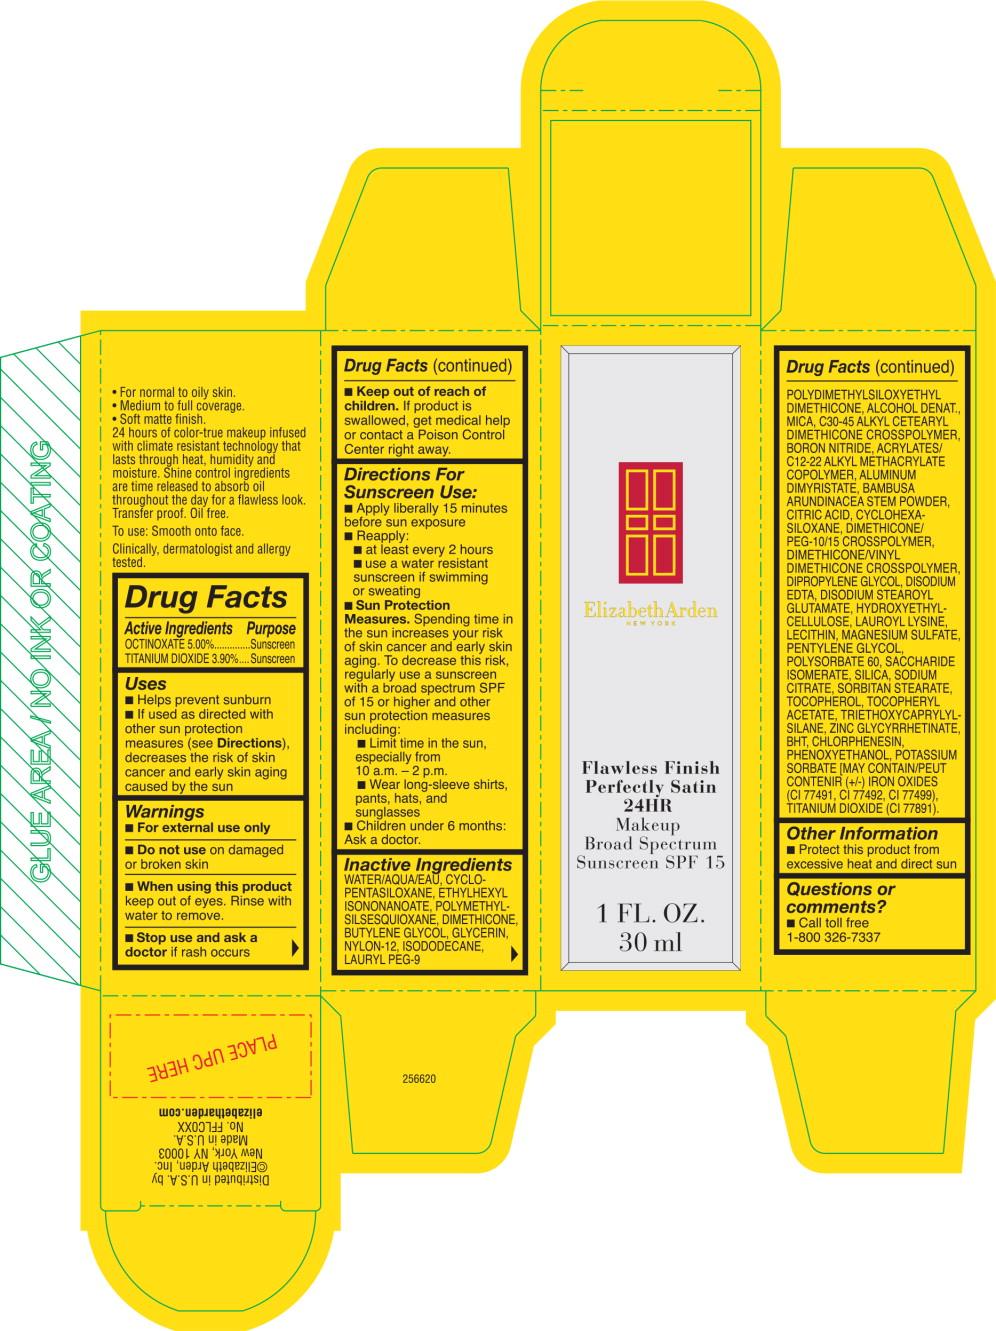 Flawless Finish Perfectly Satinb 24hr Makeup Shade Nude (Octinoxate, Titanium Dioxide) Cream [Elizabeth Arden, Inc]